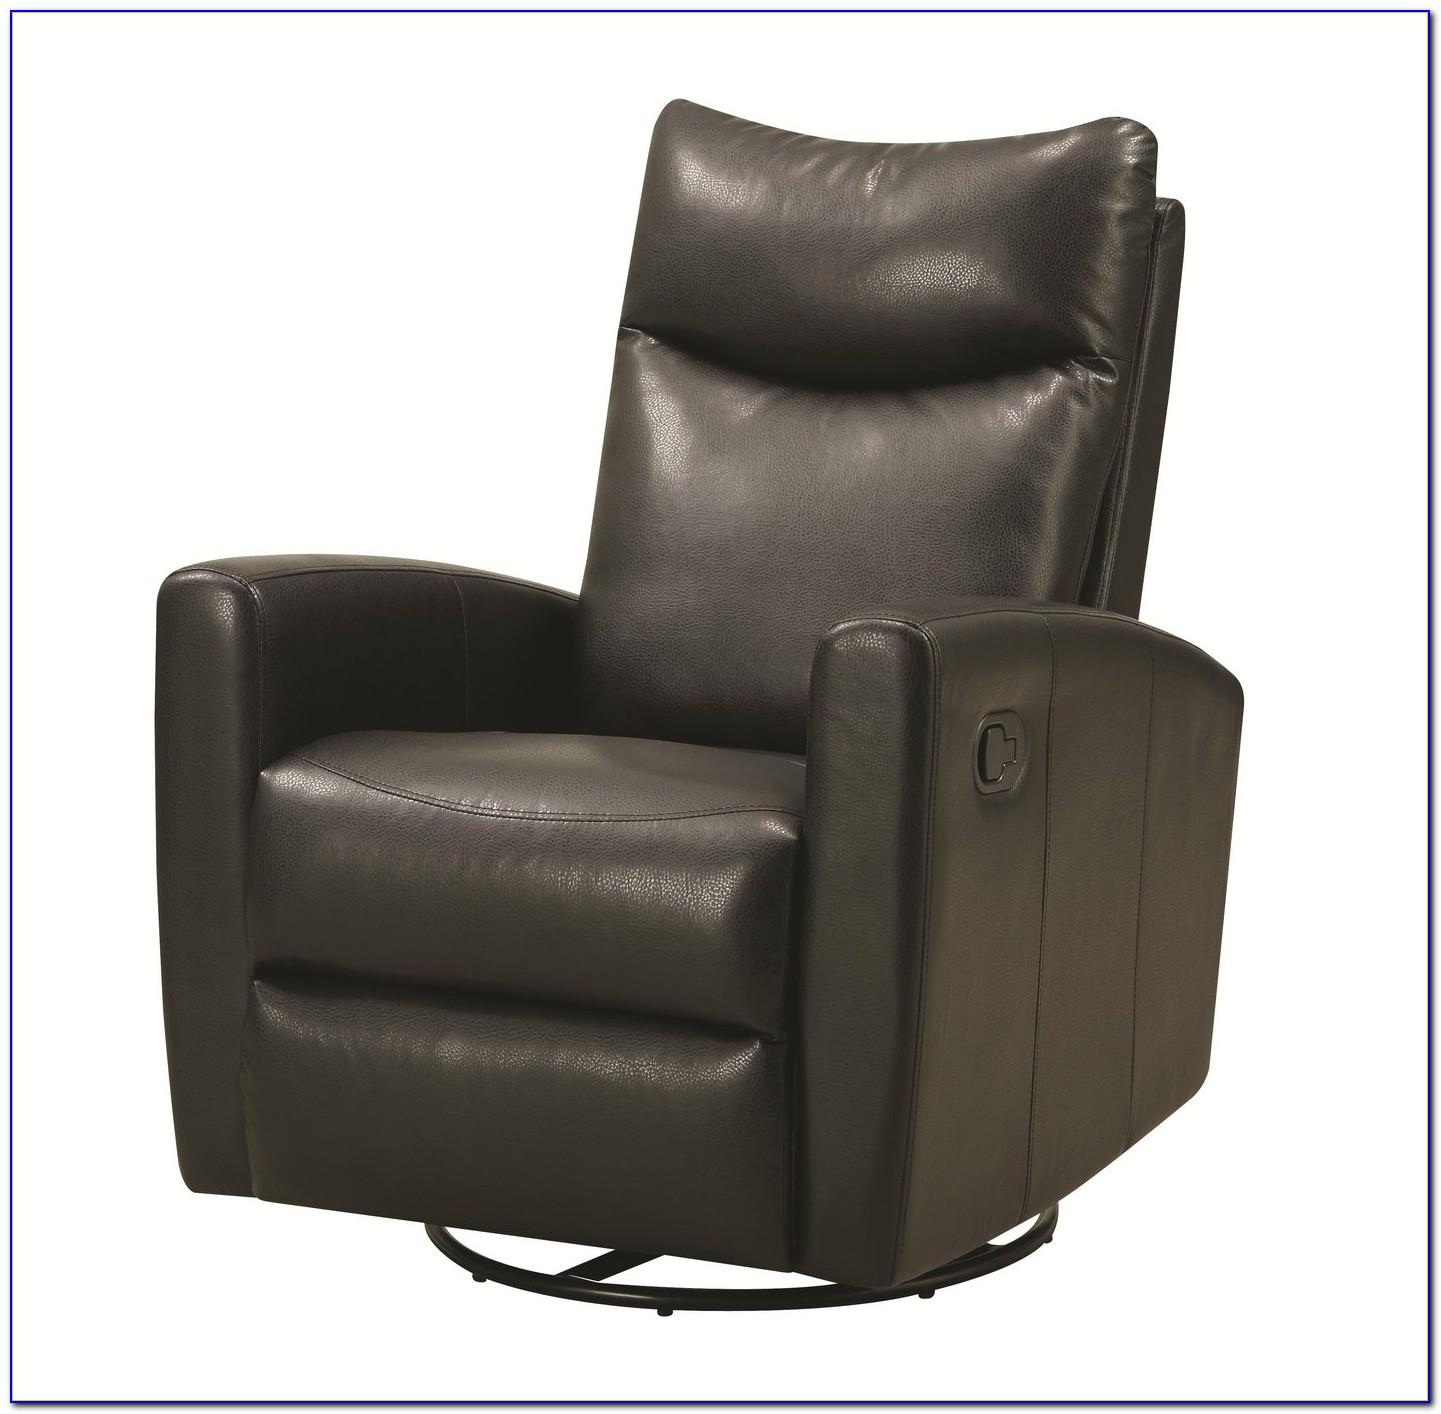 Leather Swivel Chair Gumtree